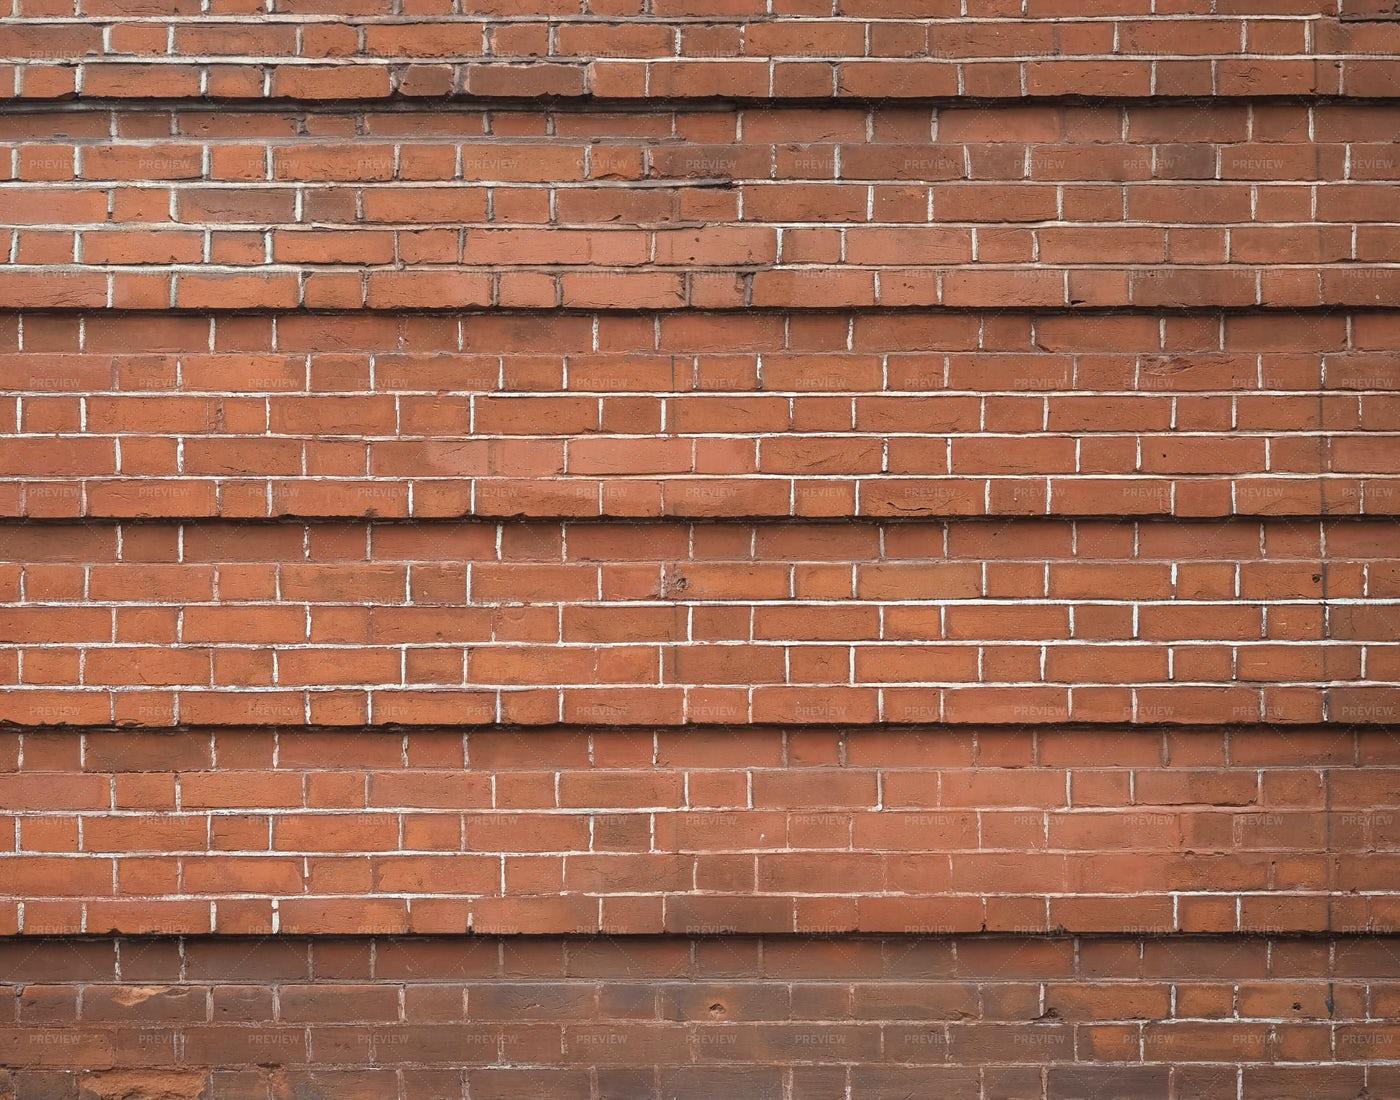 Red Brick Wall: Stock Photos